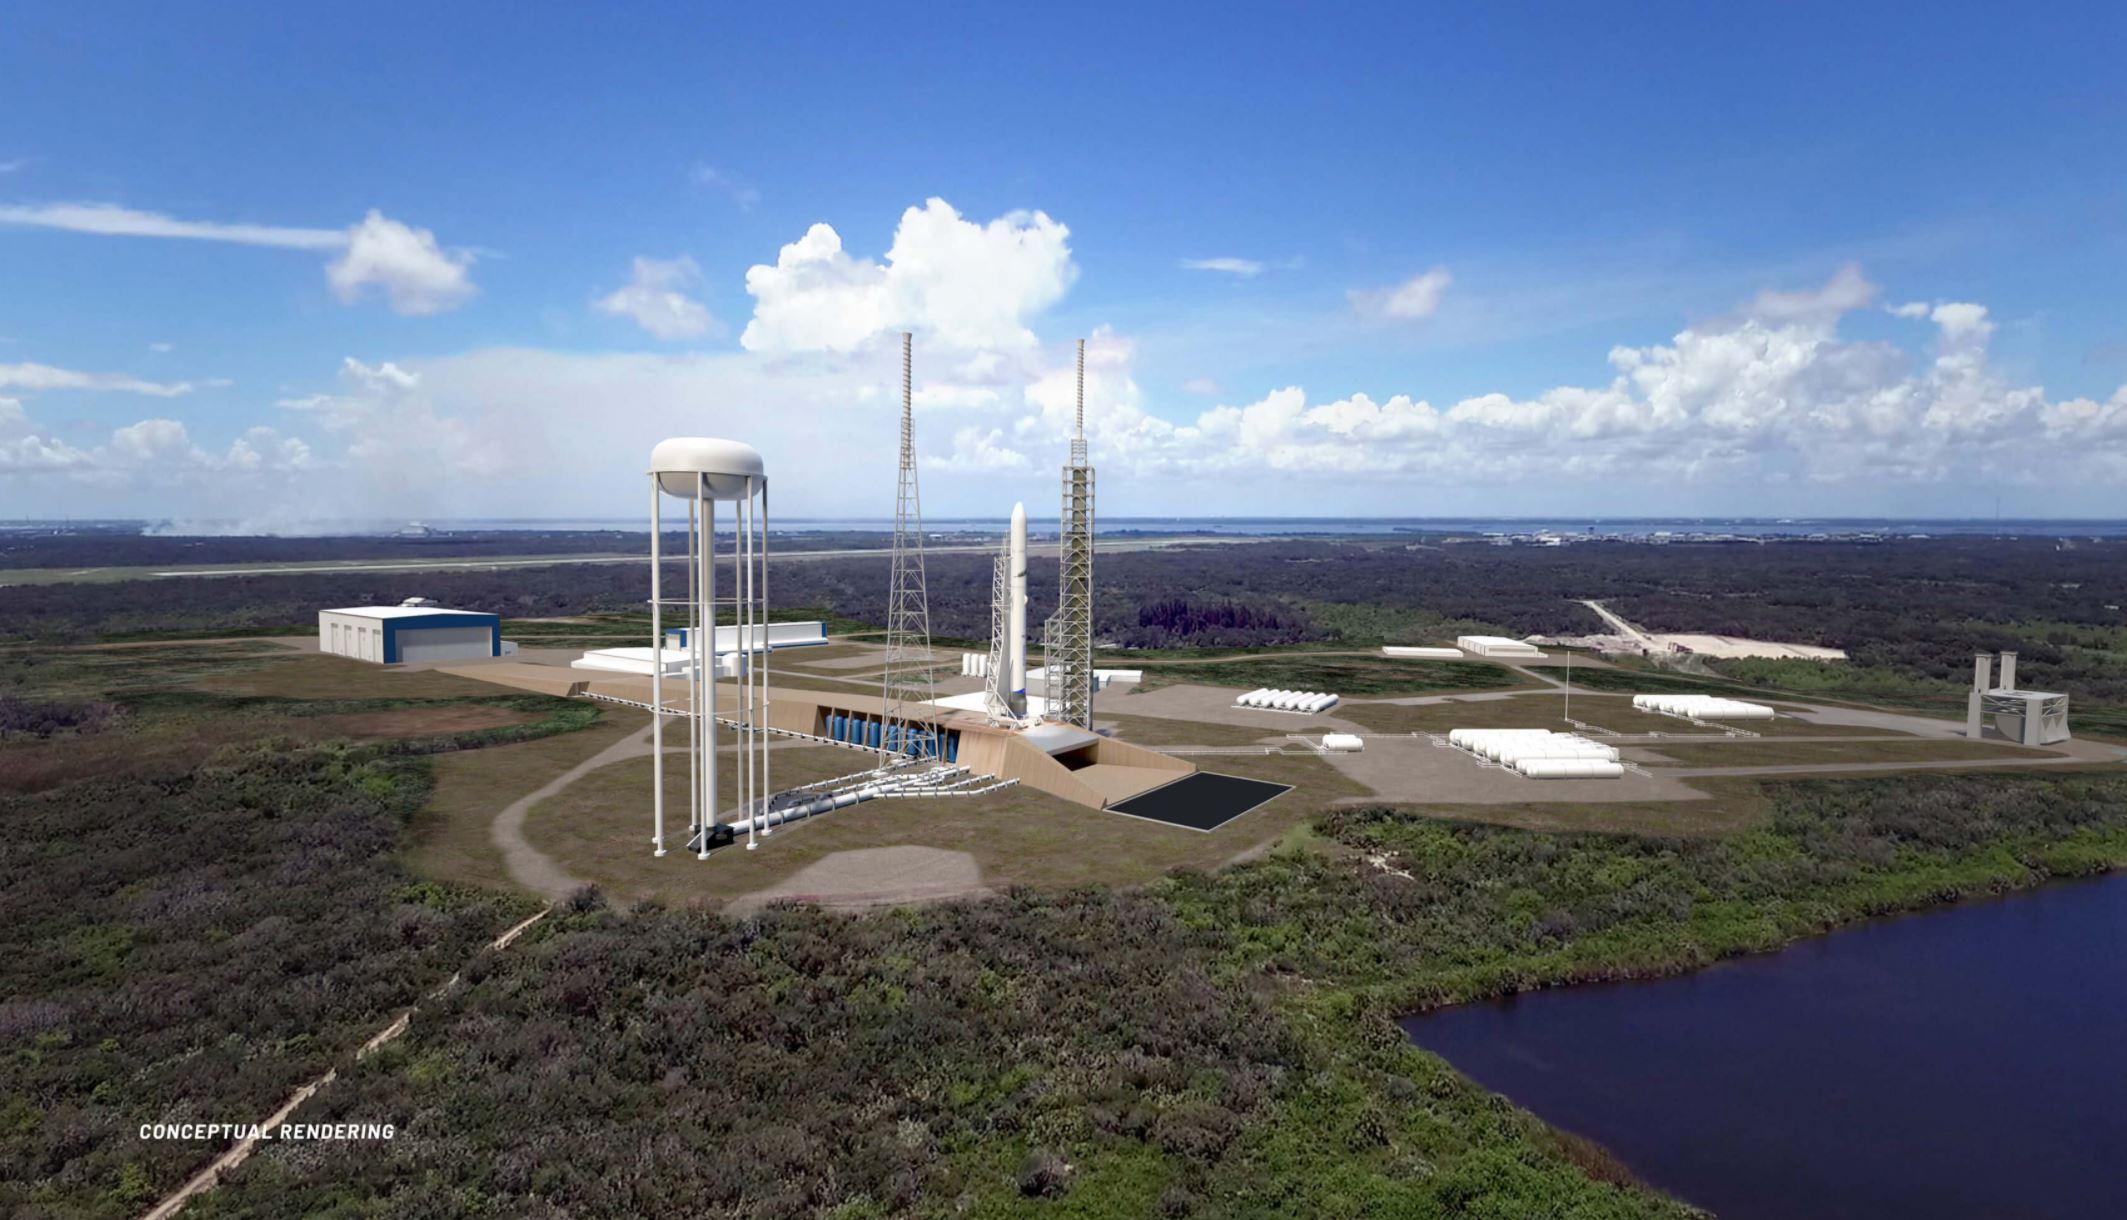 Conceptual rendering of Blue Origin's Cape Canaveral launch facilities.